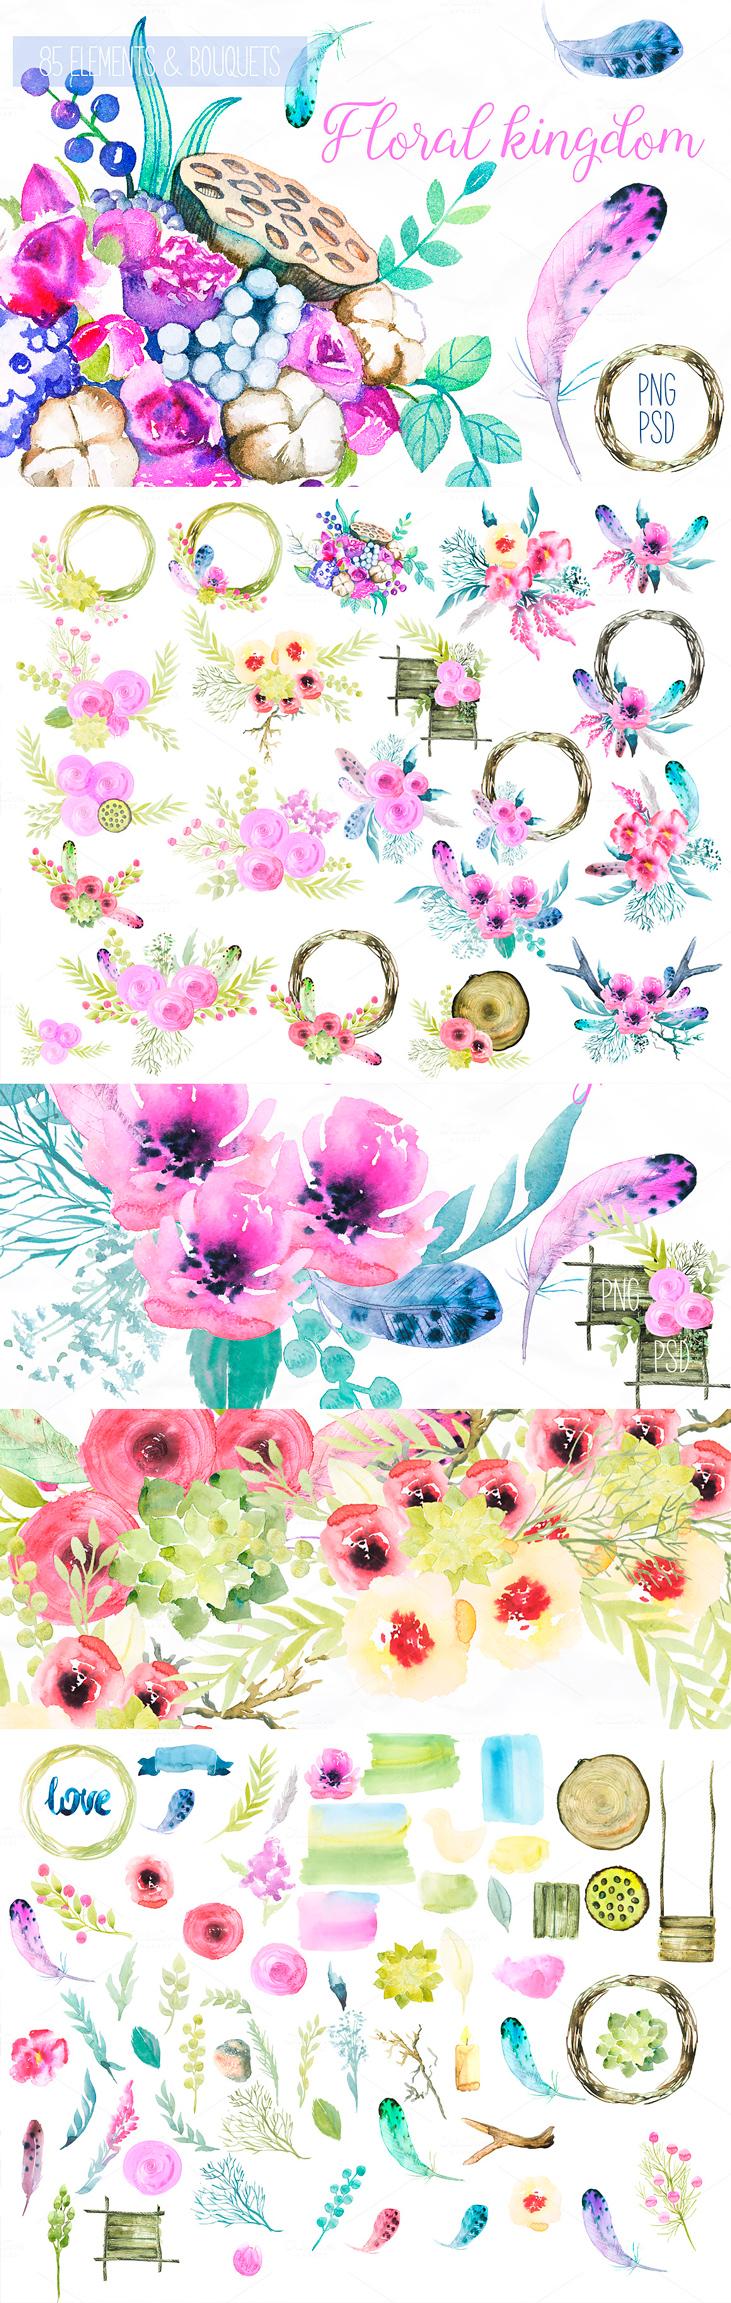 Watercolor floral flowers clip art set pink purple handpainted